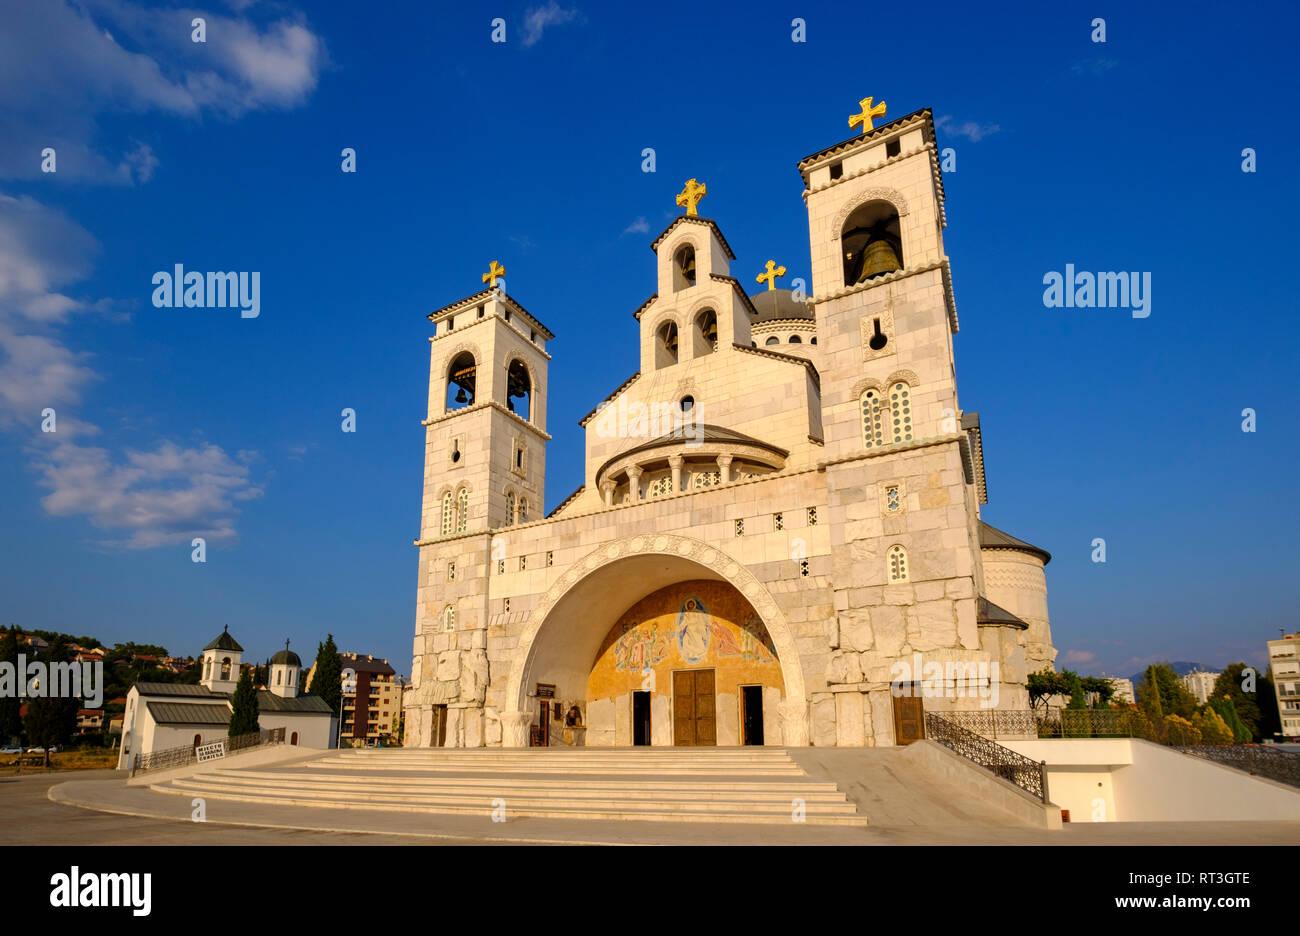 Montenegro, Podgorica, Serbian Orthodox church, Saborni Hram Hristovog Vaskrsenja - Stock Image